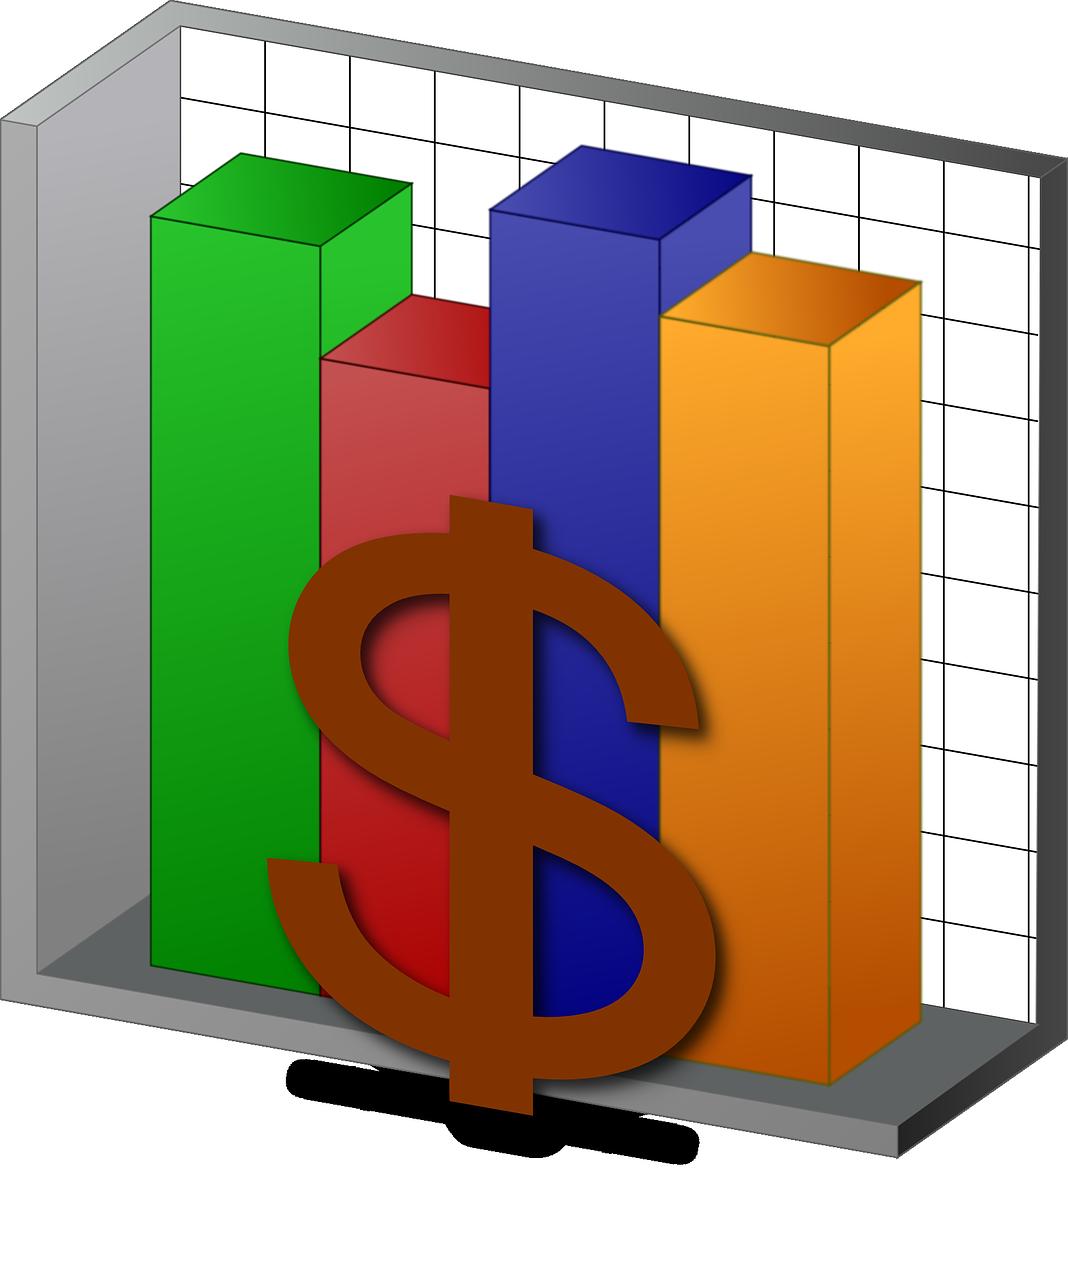 Chart financing finances free. Finance clipart budget project